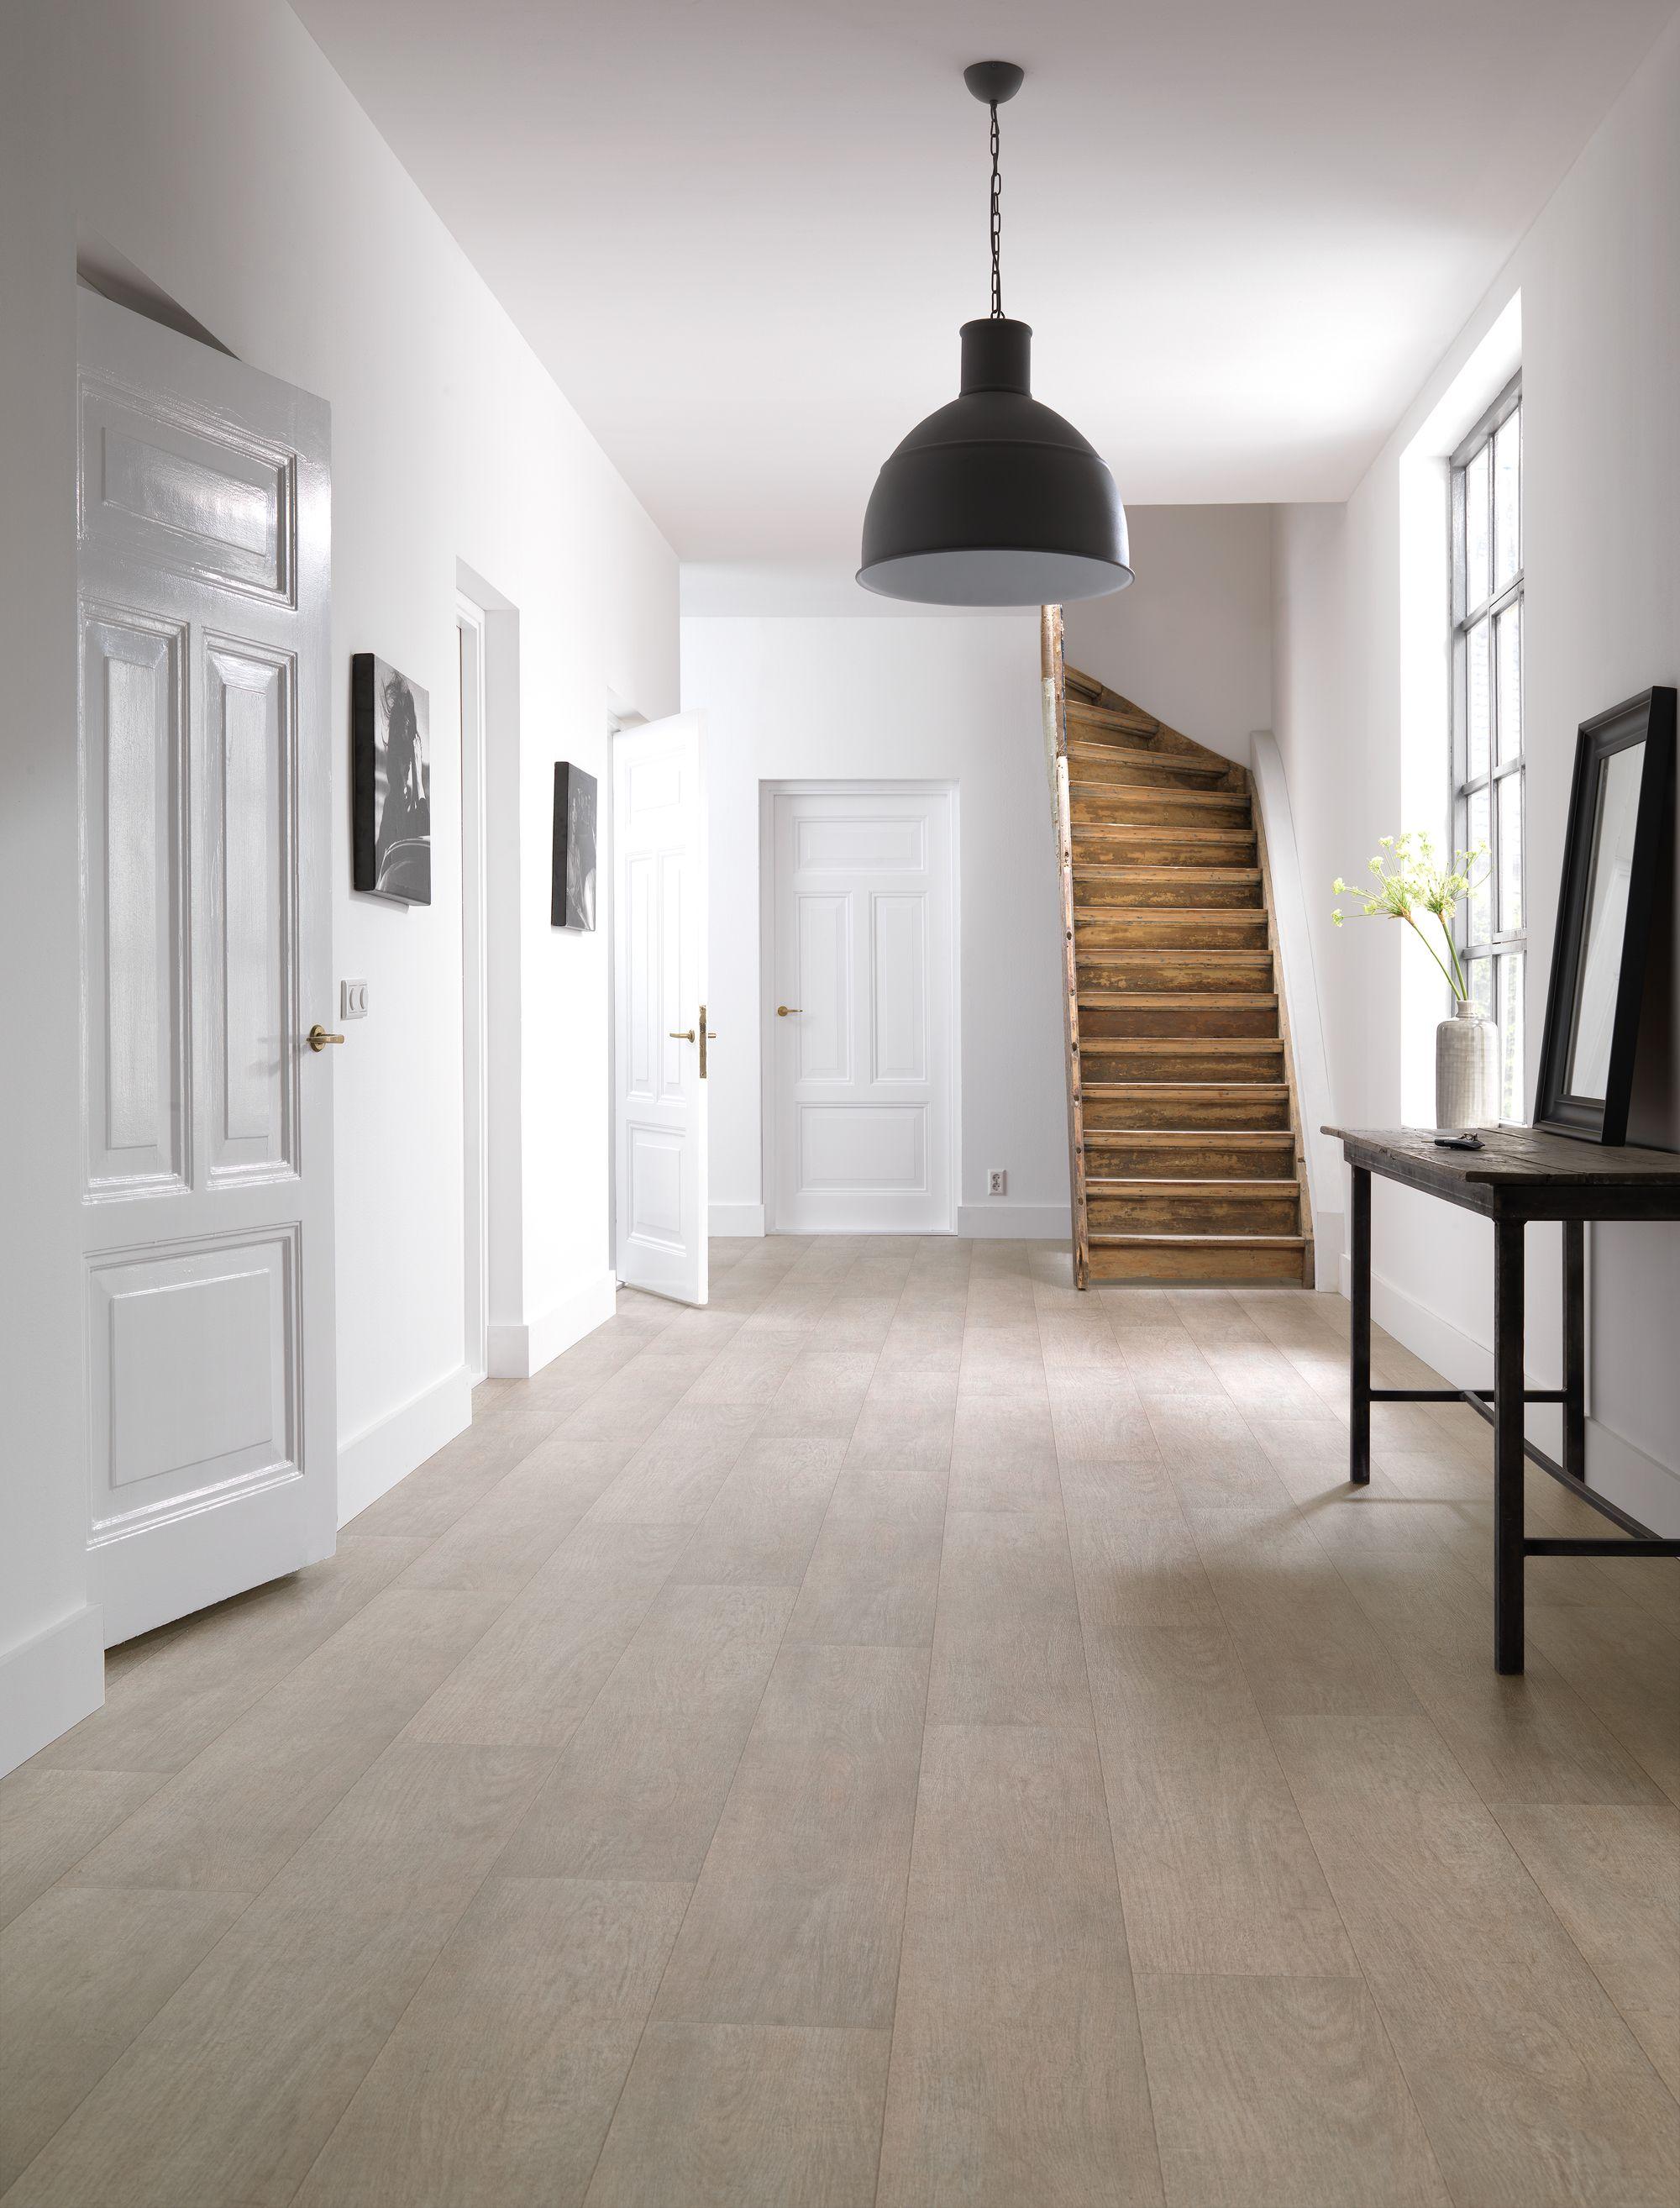 novilon prima eik 11 huisdecoratie pinterest fu boden parkett und boden. Black Bedroom Furniture Sets. Home Design Ideas